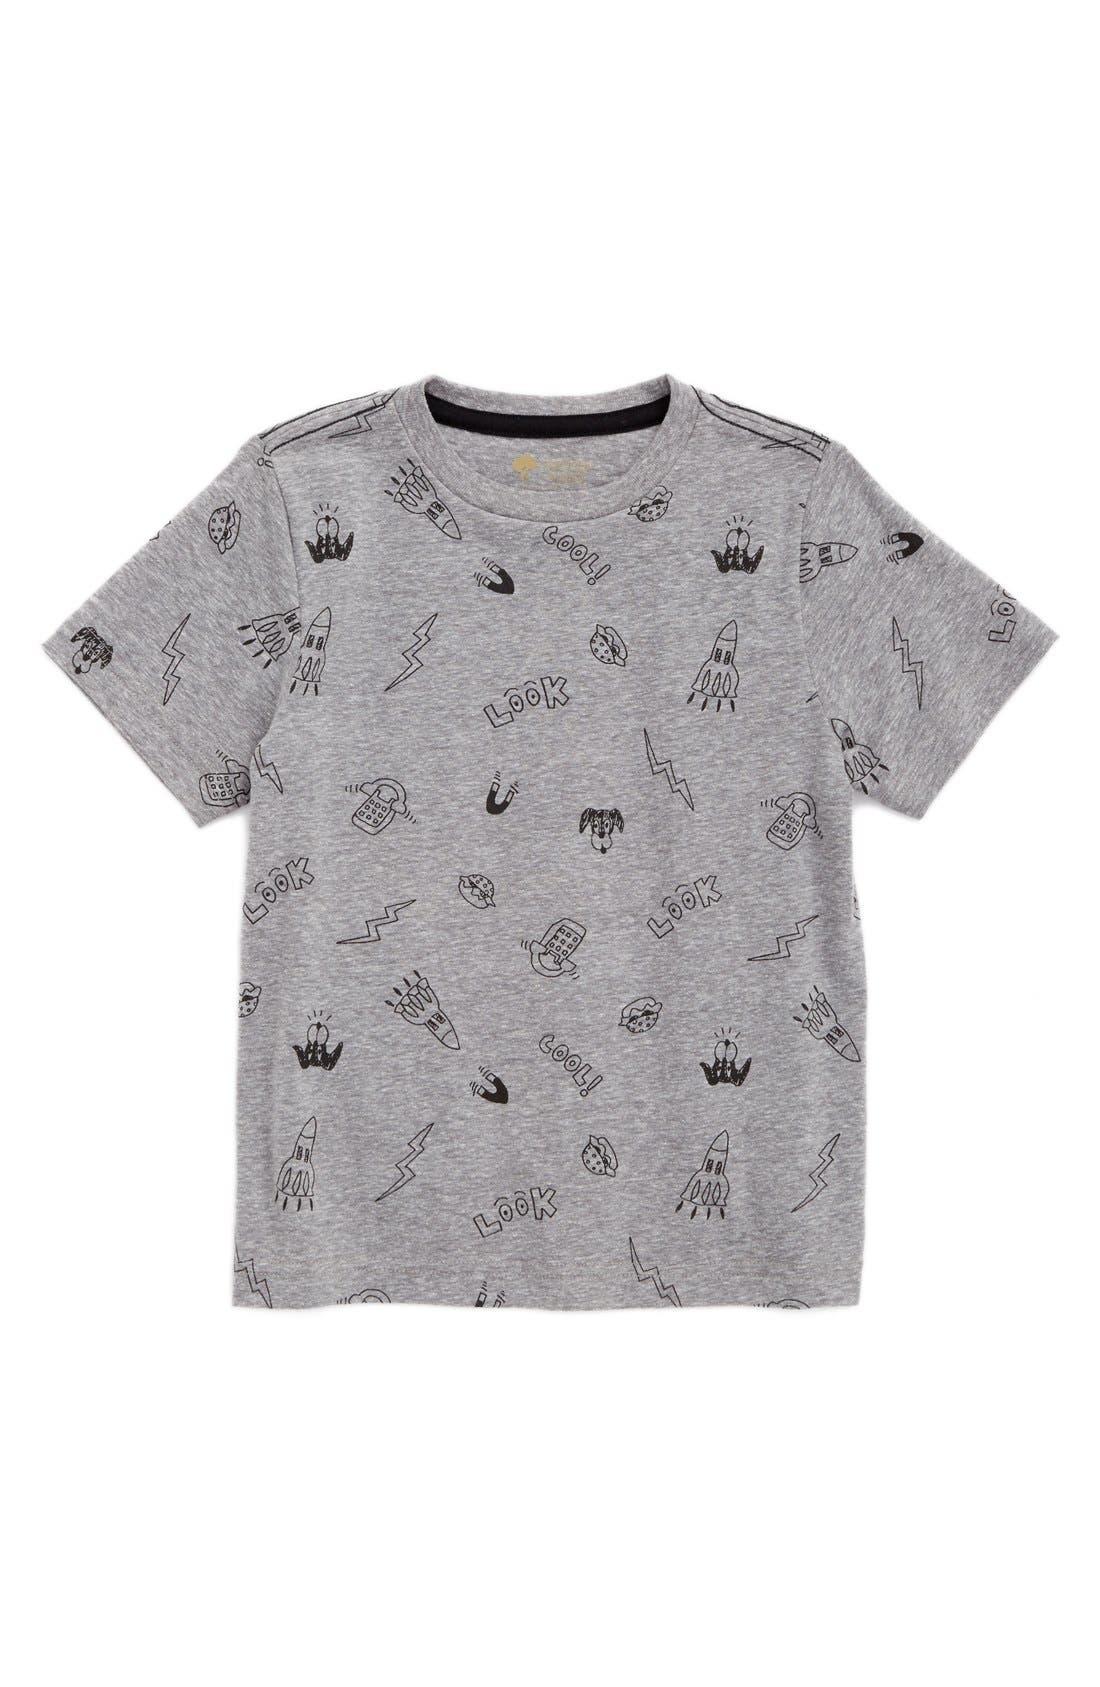 Main Image - Tucker + Tate Graphic T-Shirt (Toddler Boys & Little Boys)